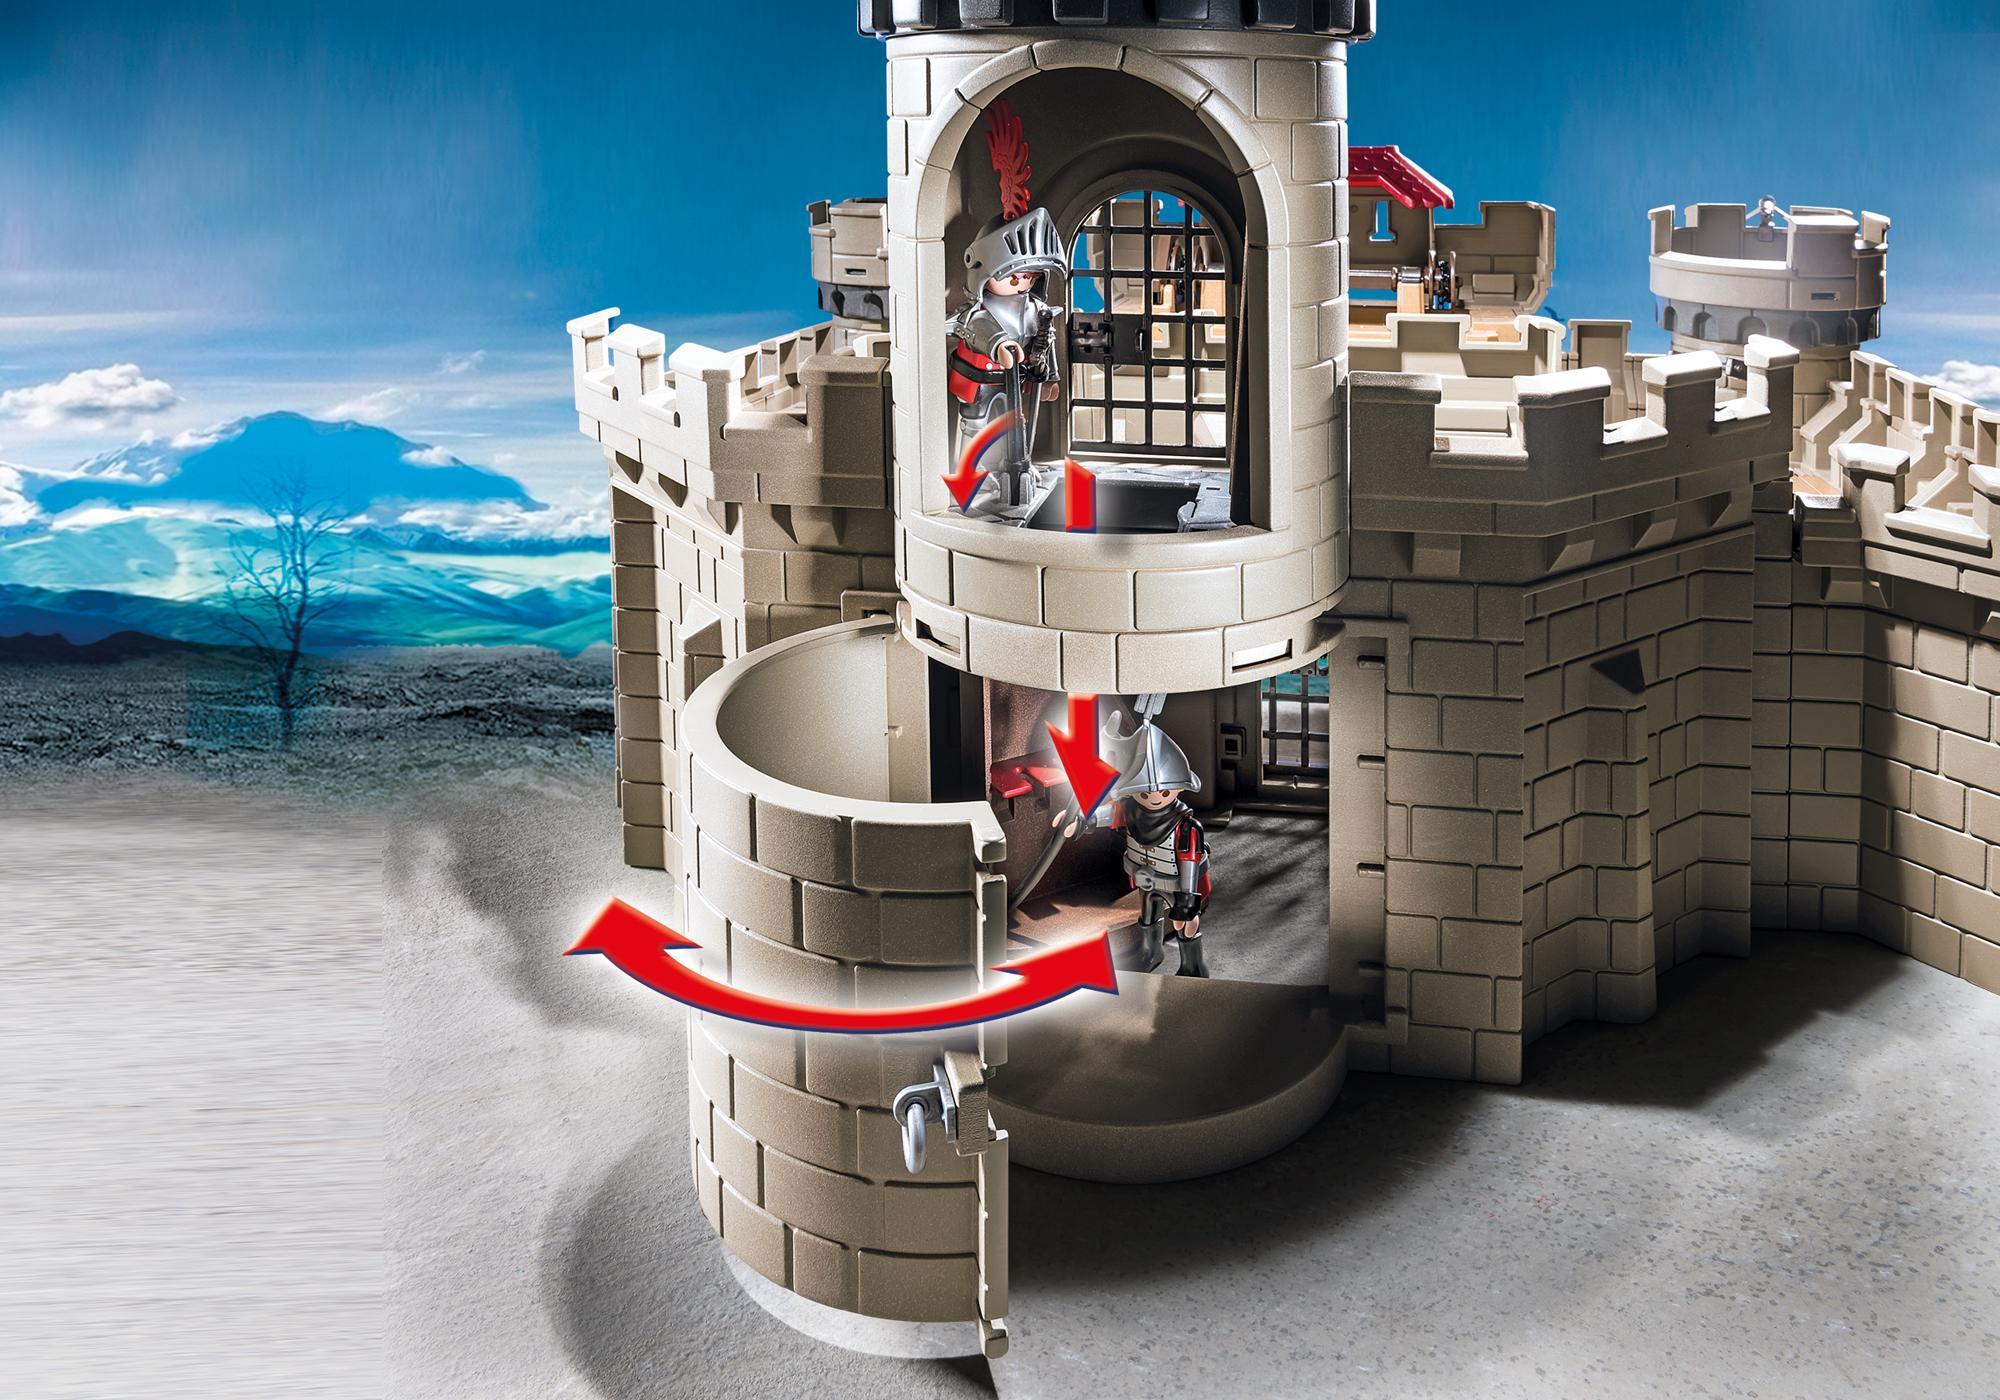 http://media.playmobil.com/i/playmobil/6001_product_extra3/Burcht van de orde van de Valkenridders